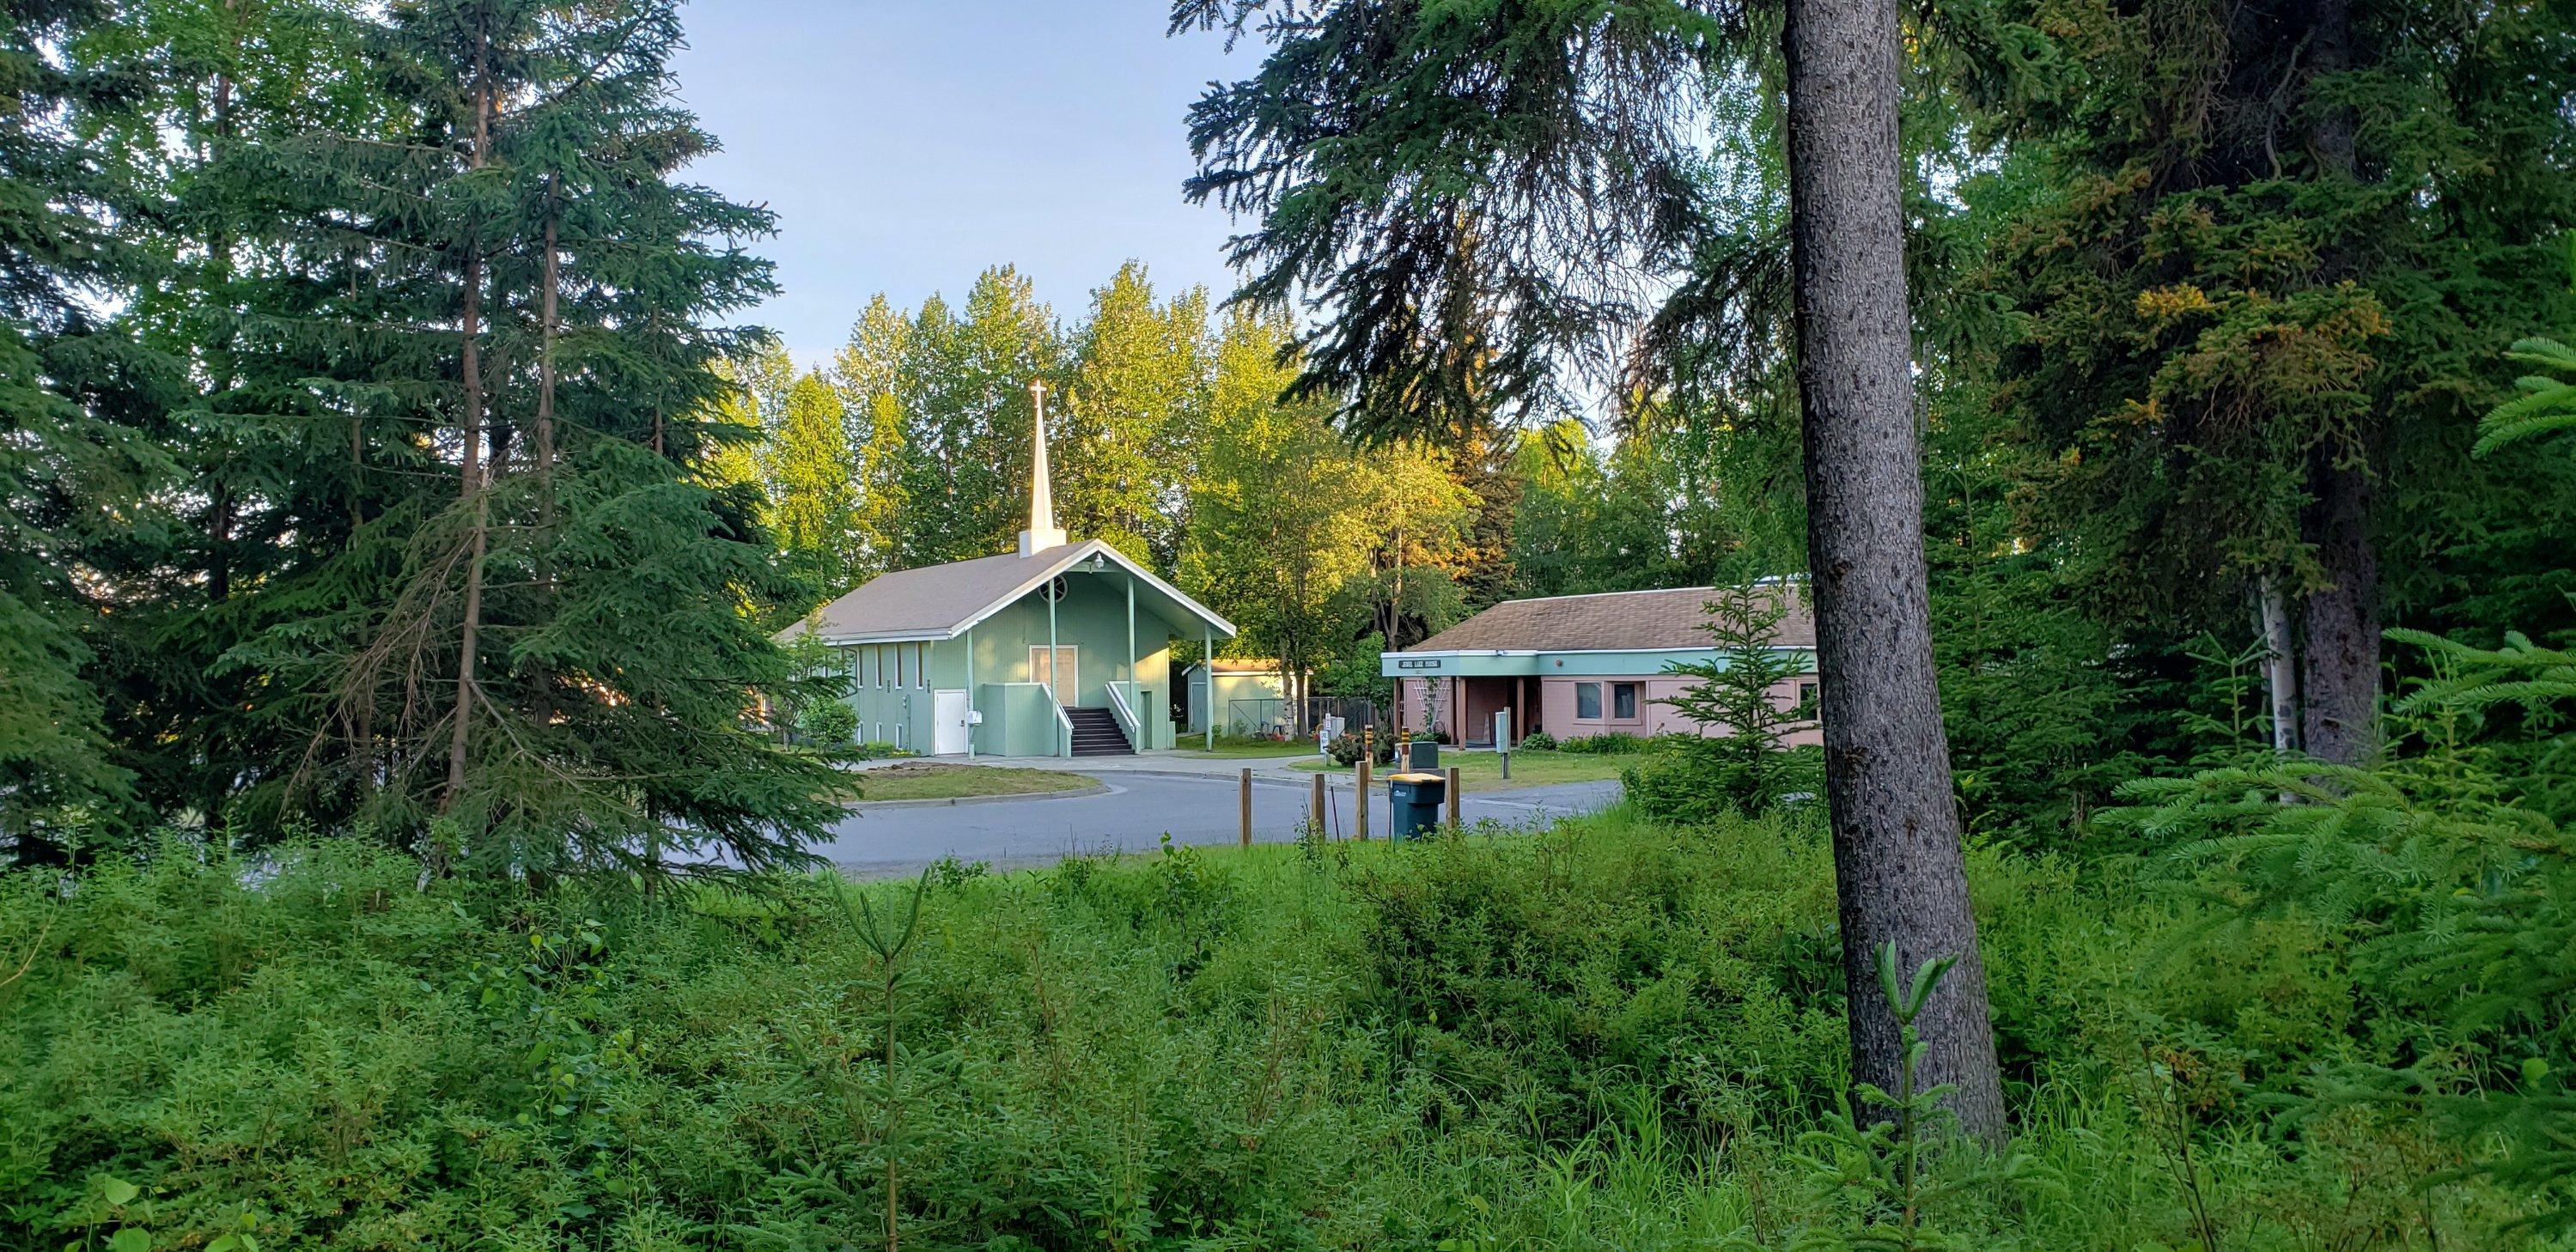 Picture of JLP.church, where I serve.